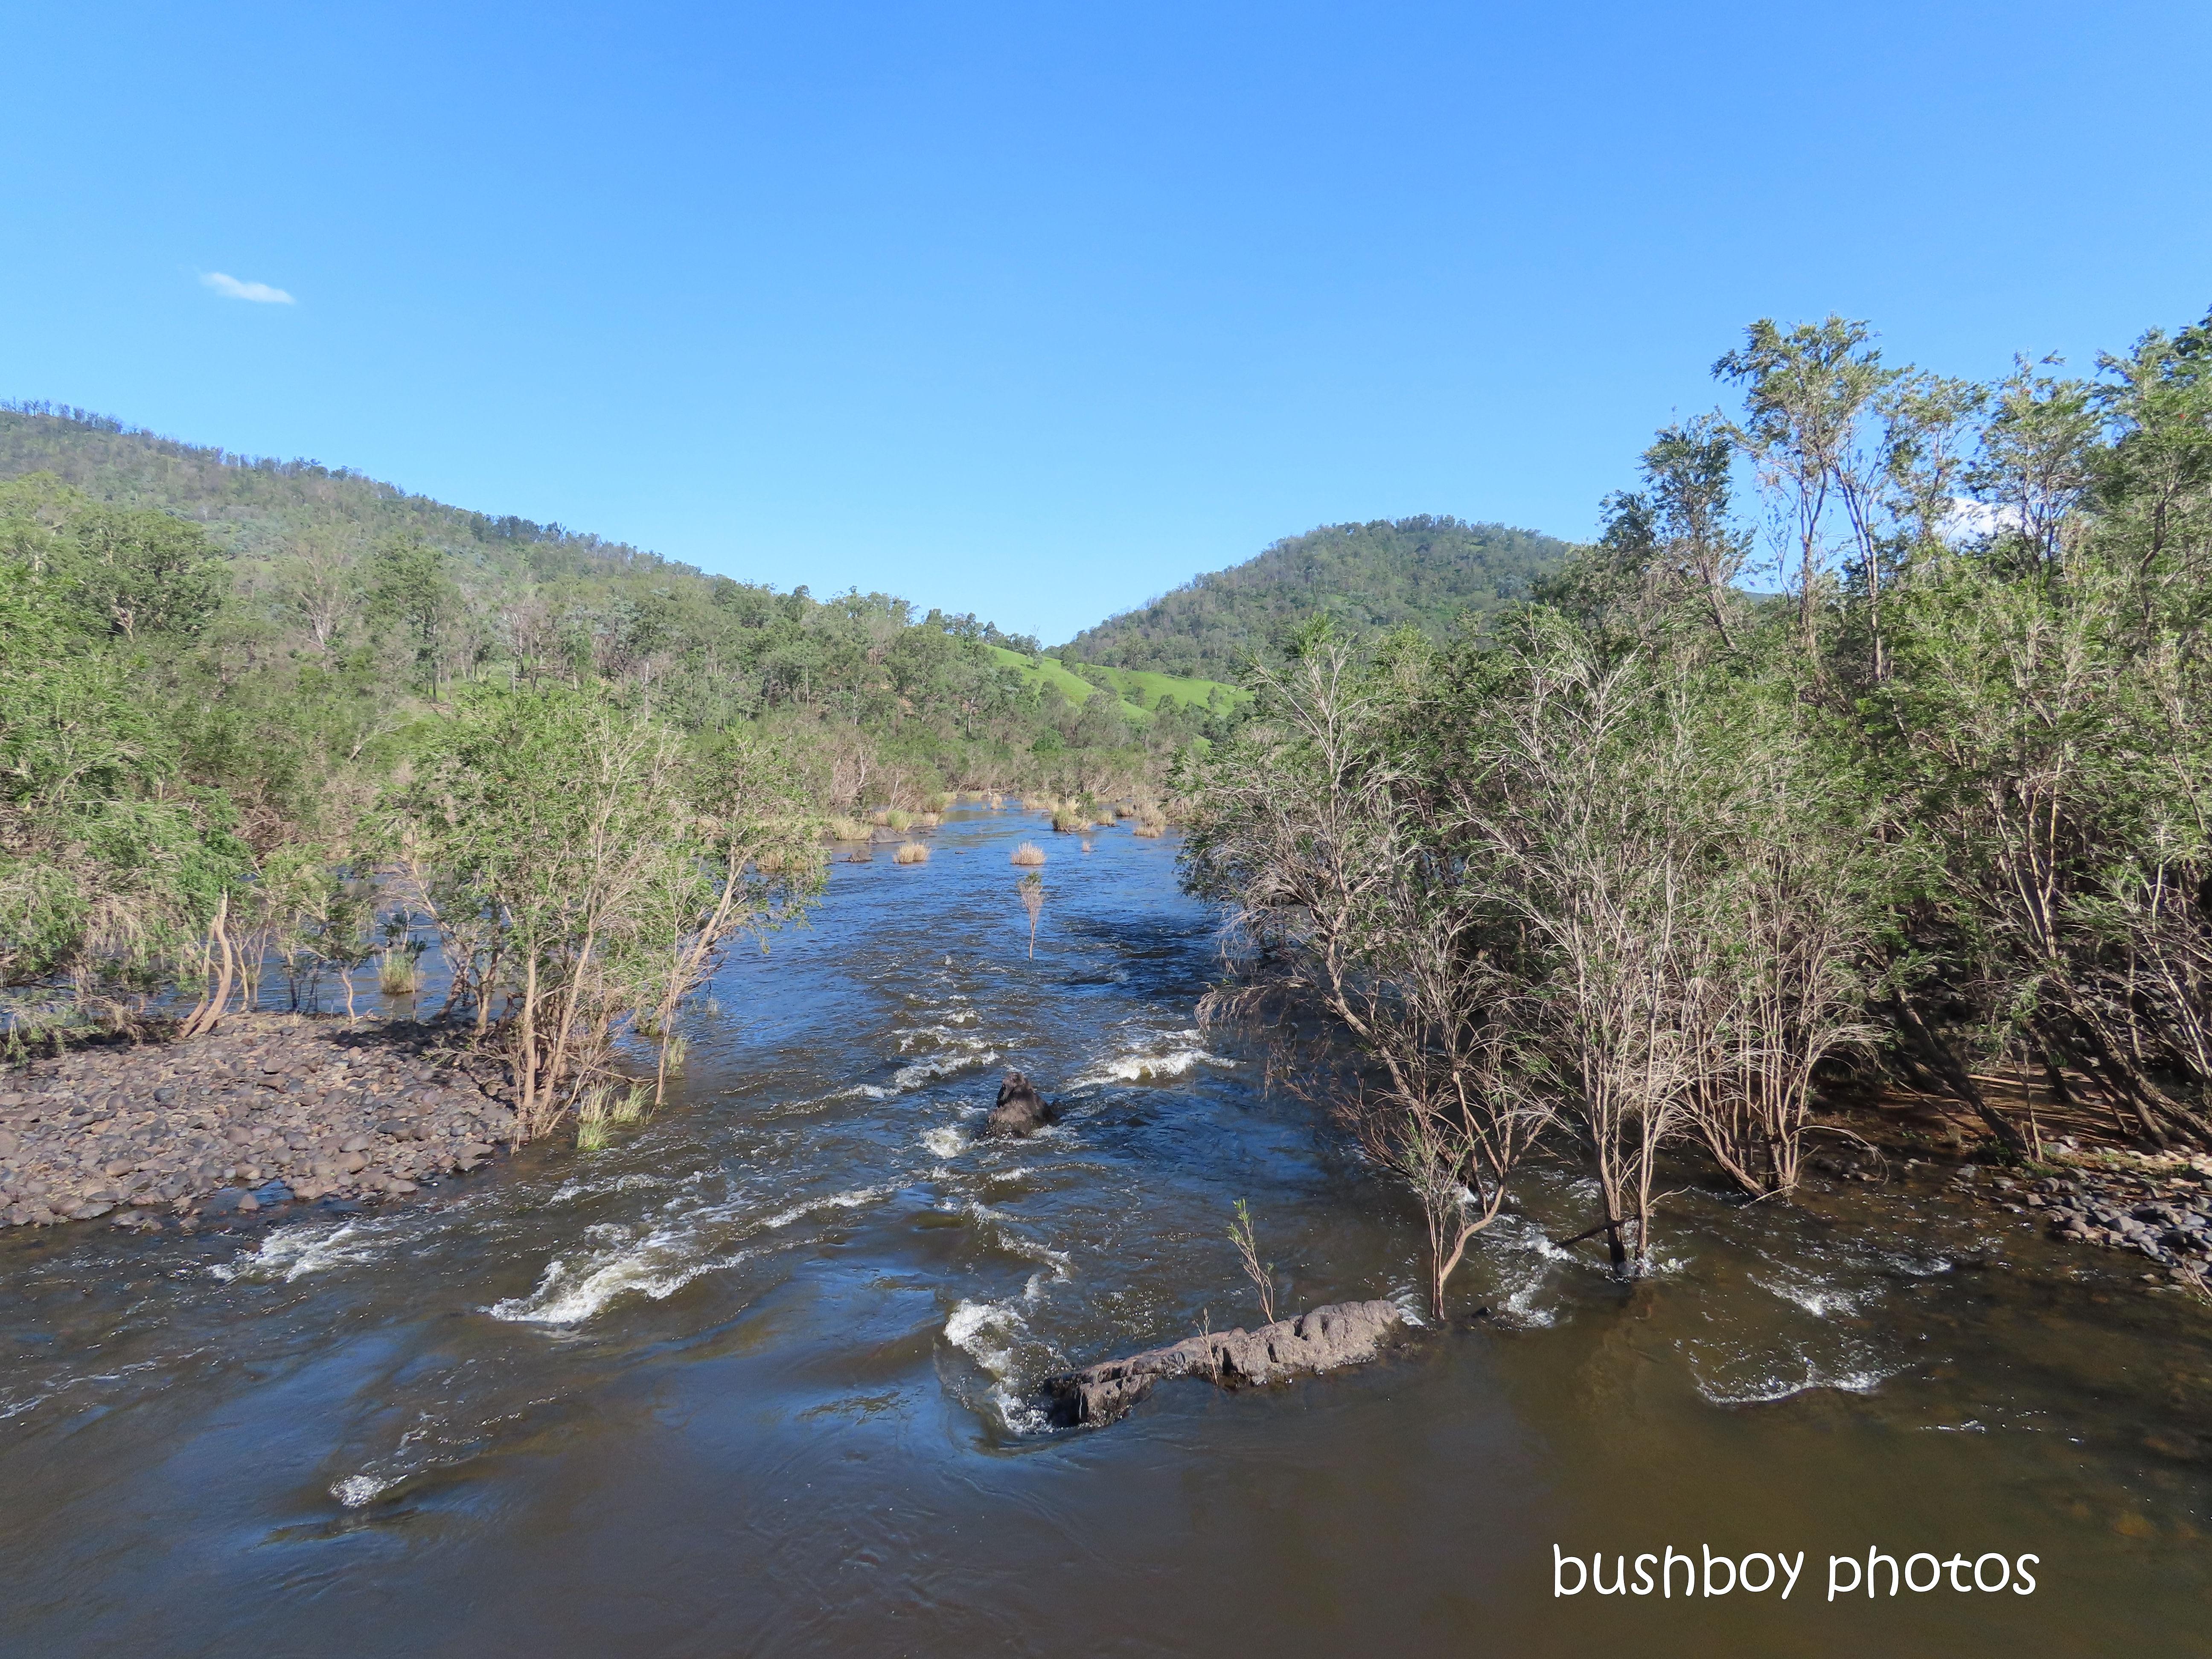 20200322_blog challenge_river_clarence river_carnham_downstream